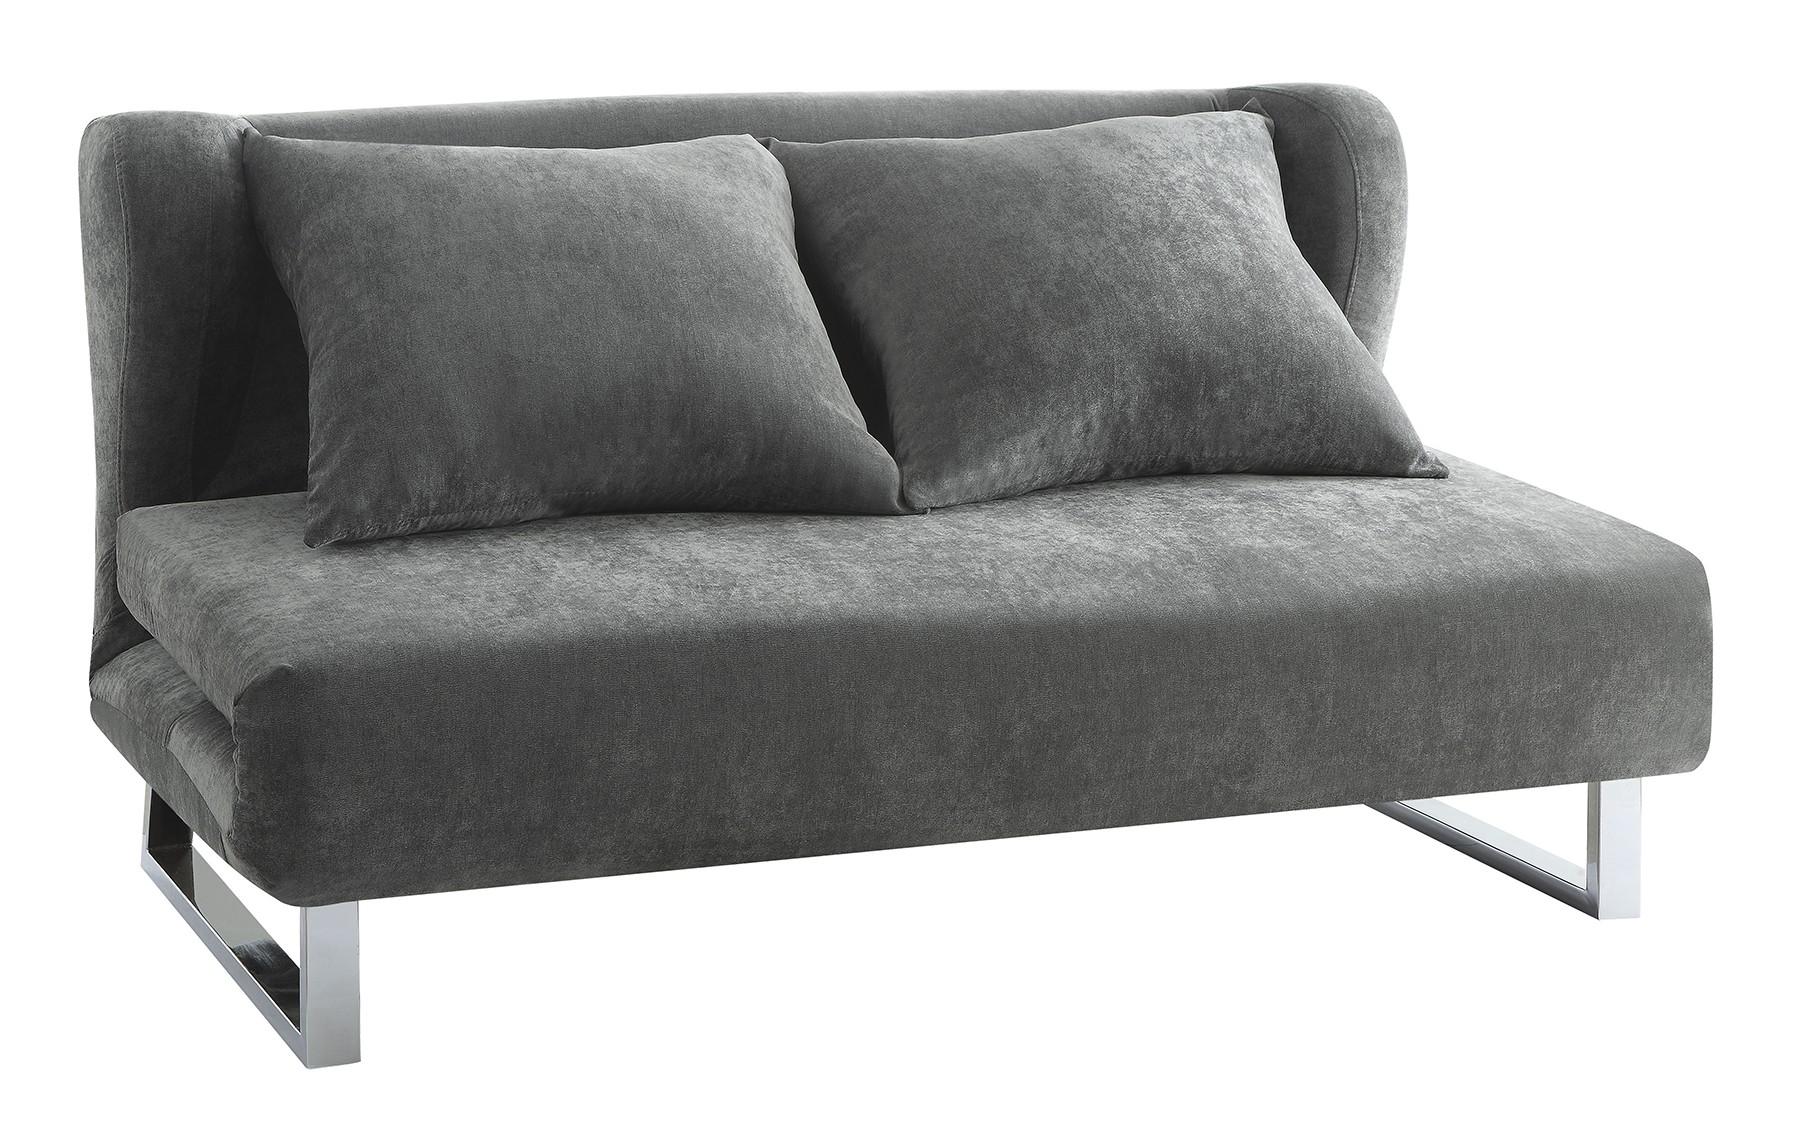 Small Sleeper Sofa Chaise